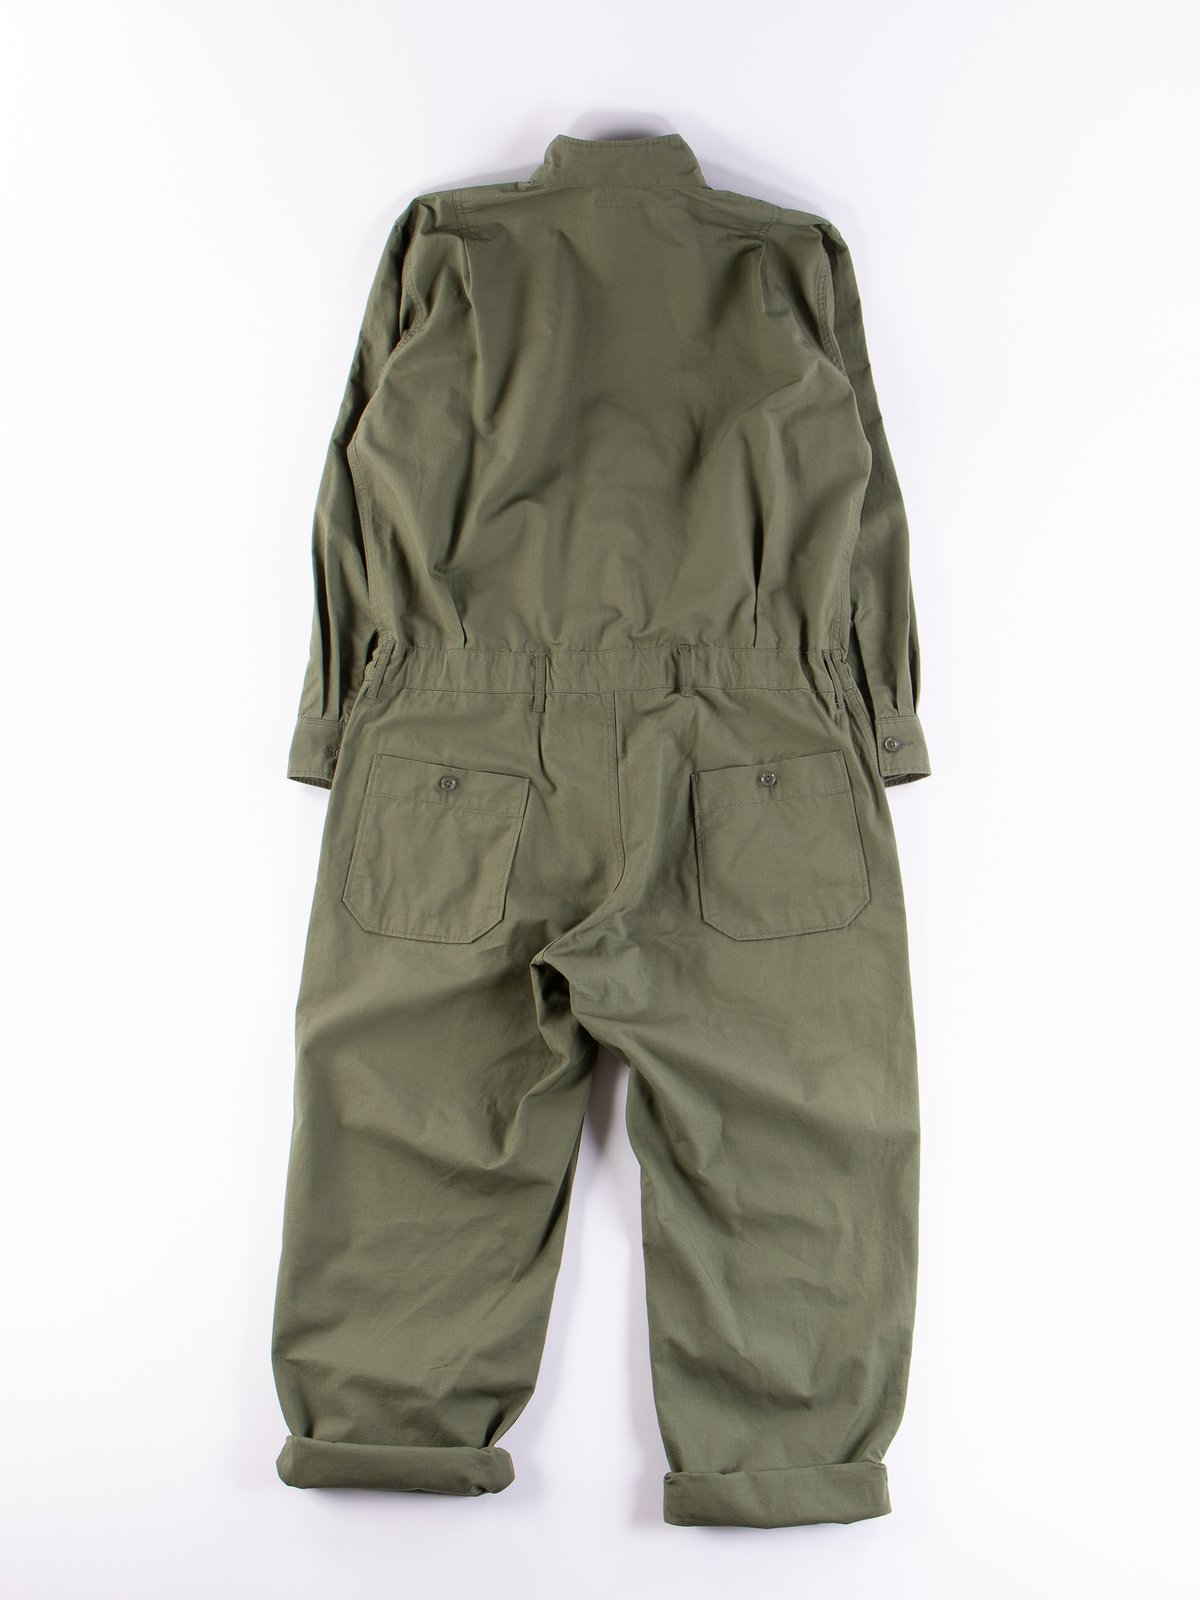 Olive Cotton Ripstop Boiler Suit - Image 8